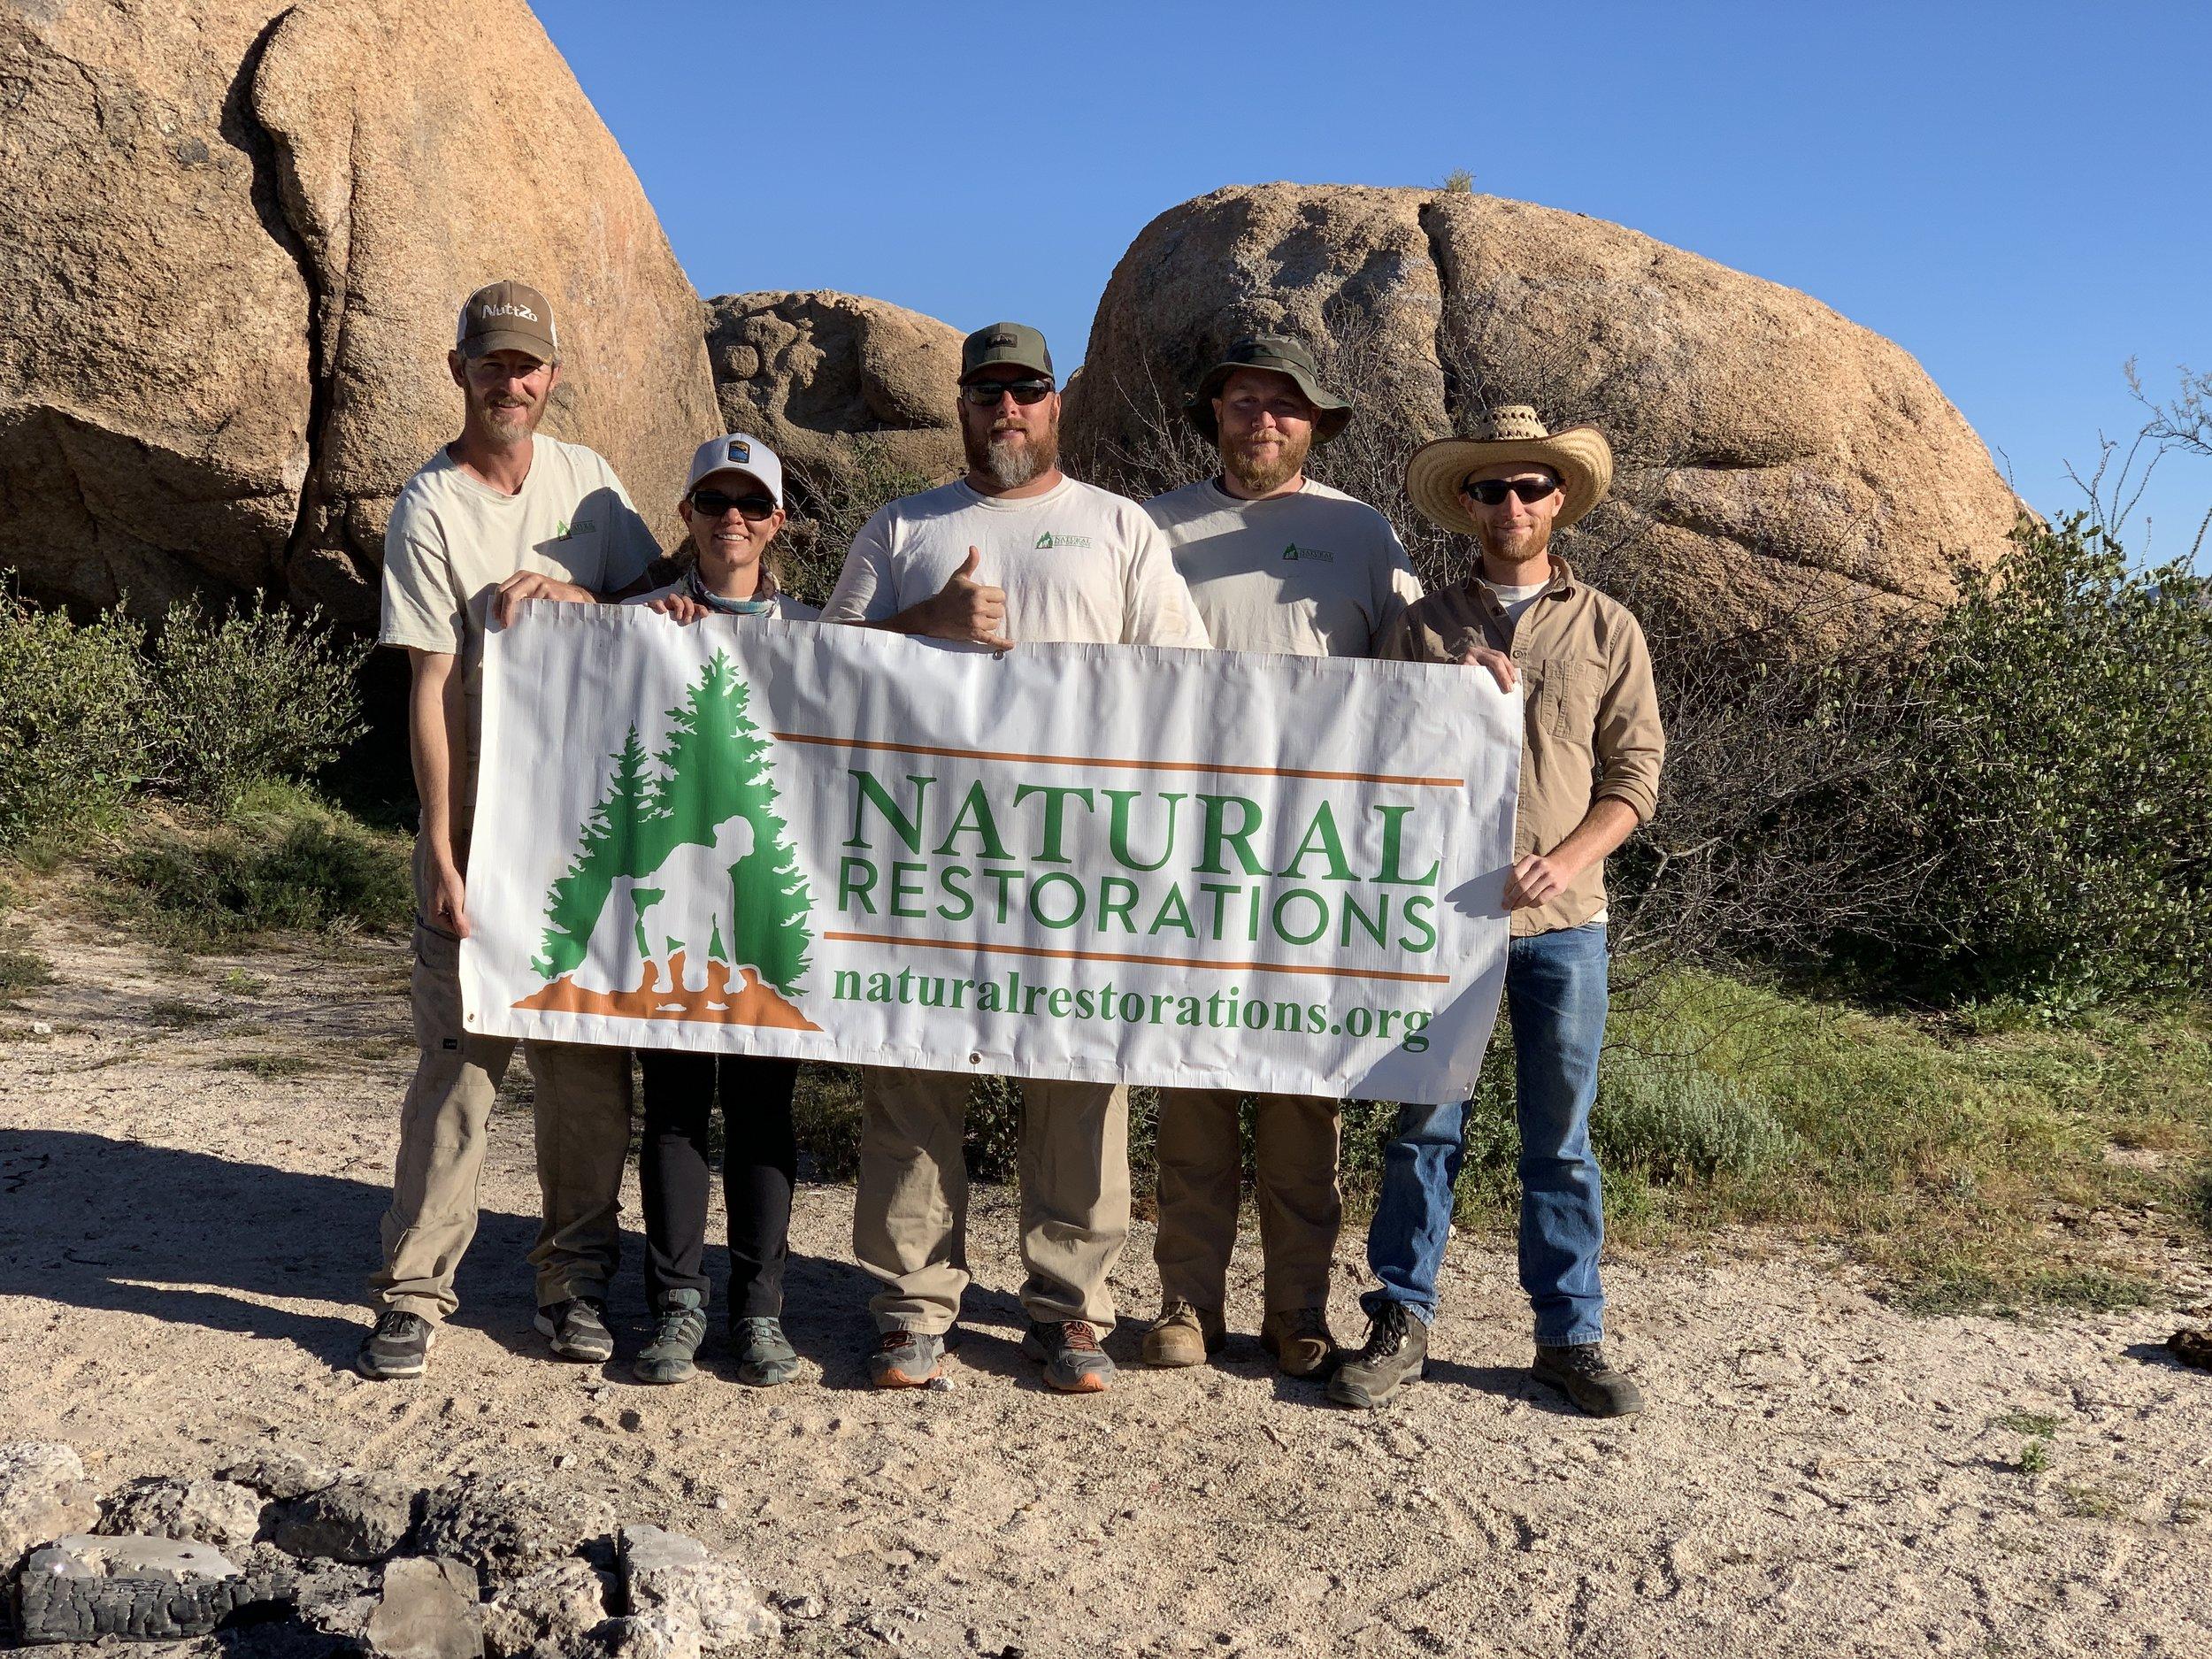 Natural Restorations Dedicated Restoration Team - March 2019